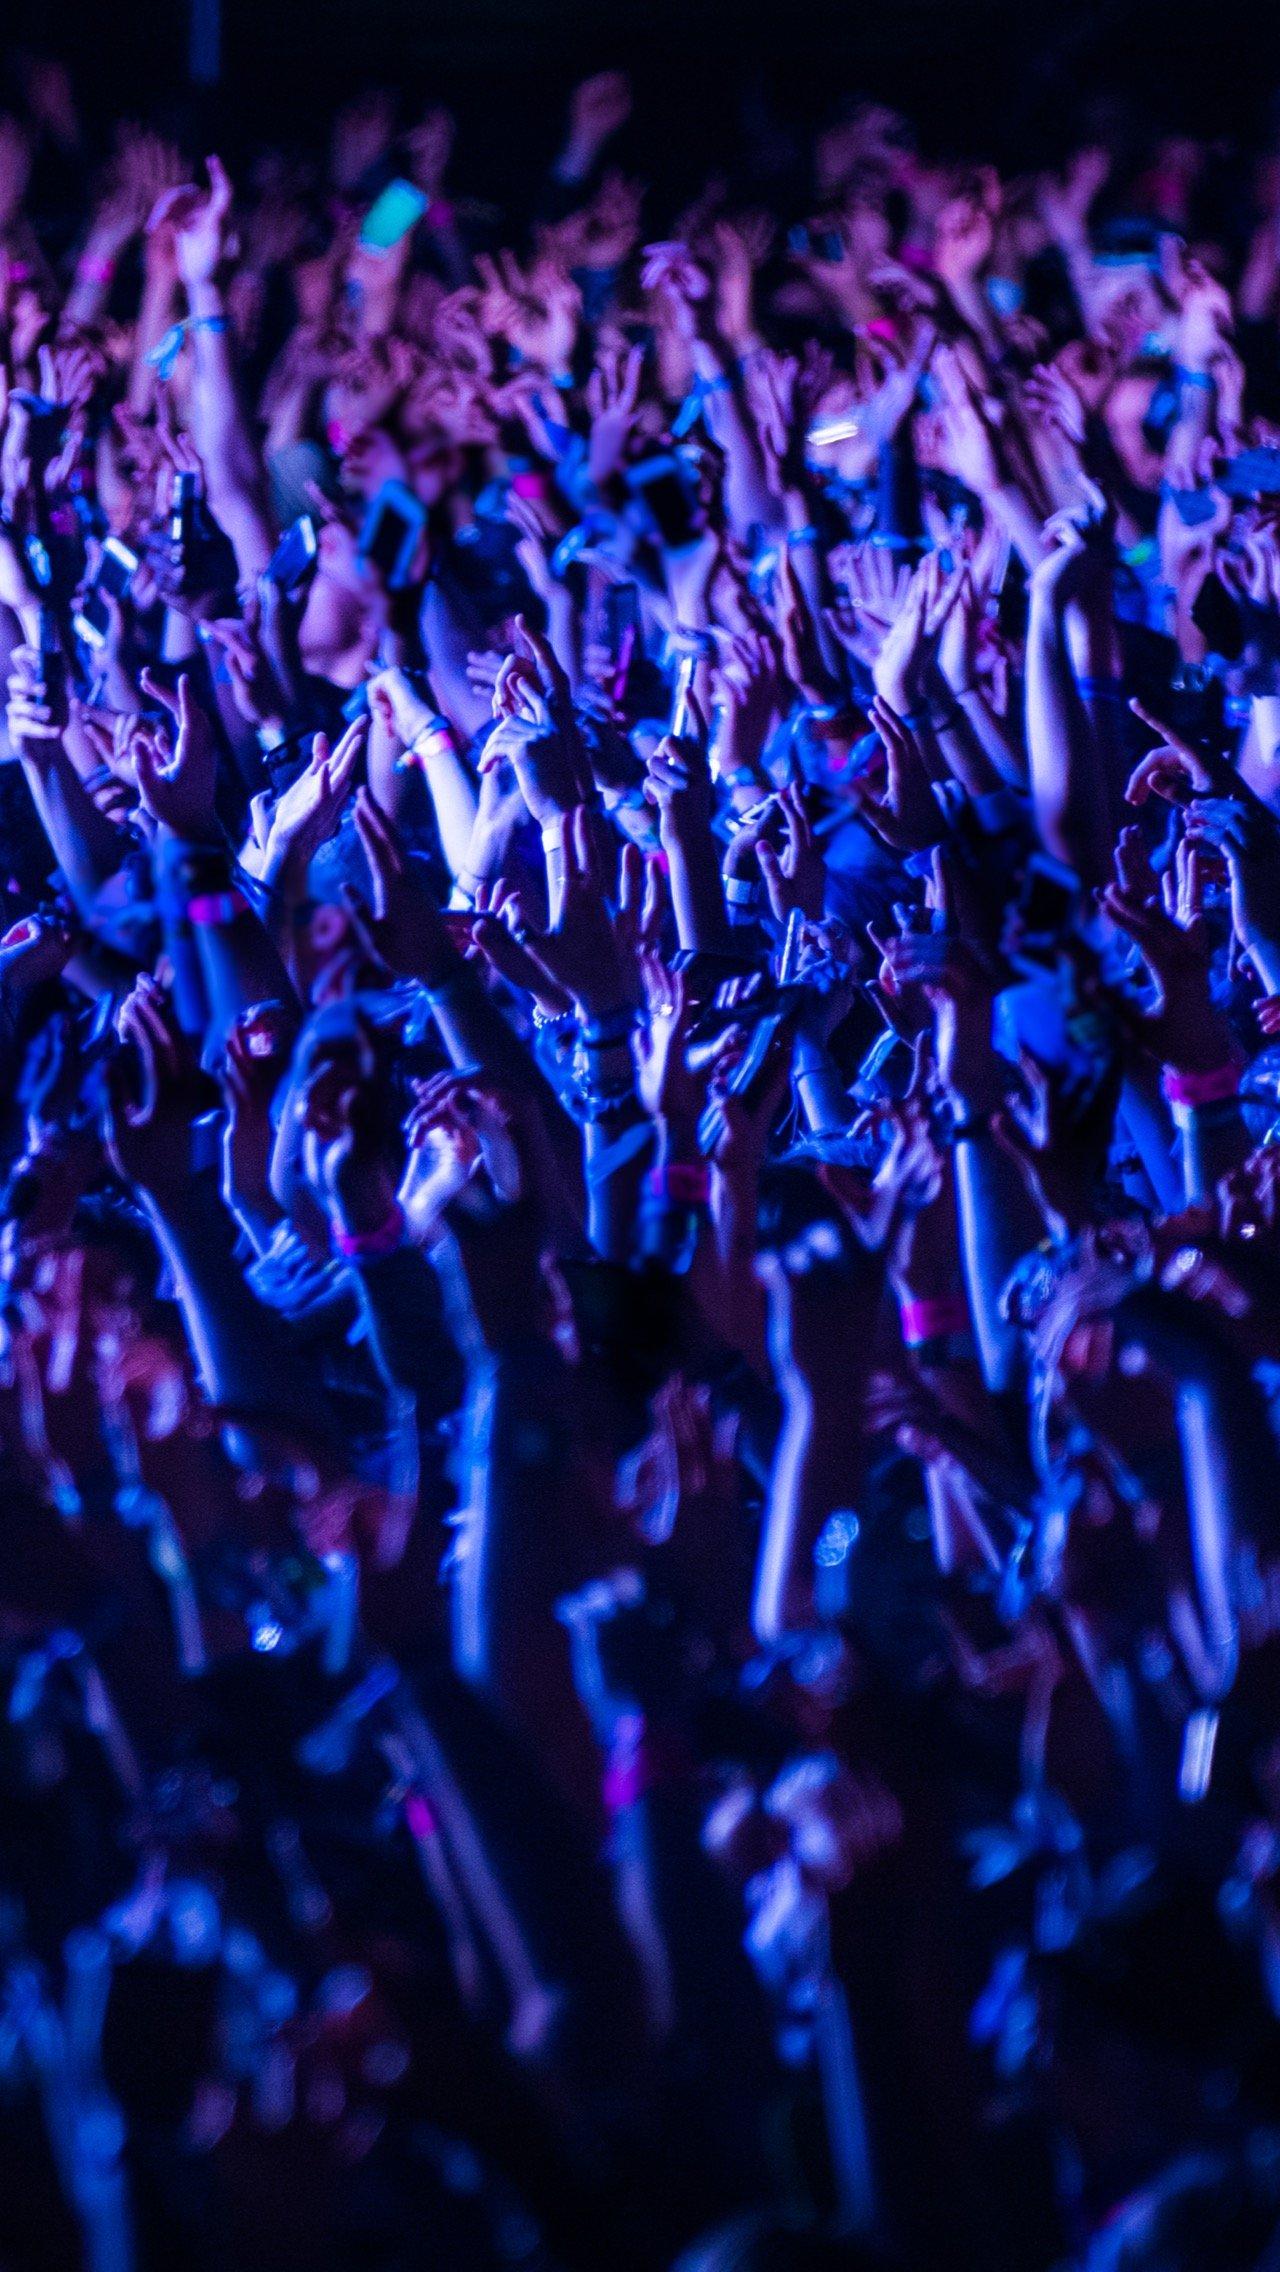 Trancemission Summer Magic,11-12 июня, Adrenaline Stadium